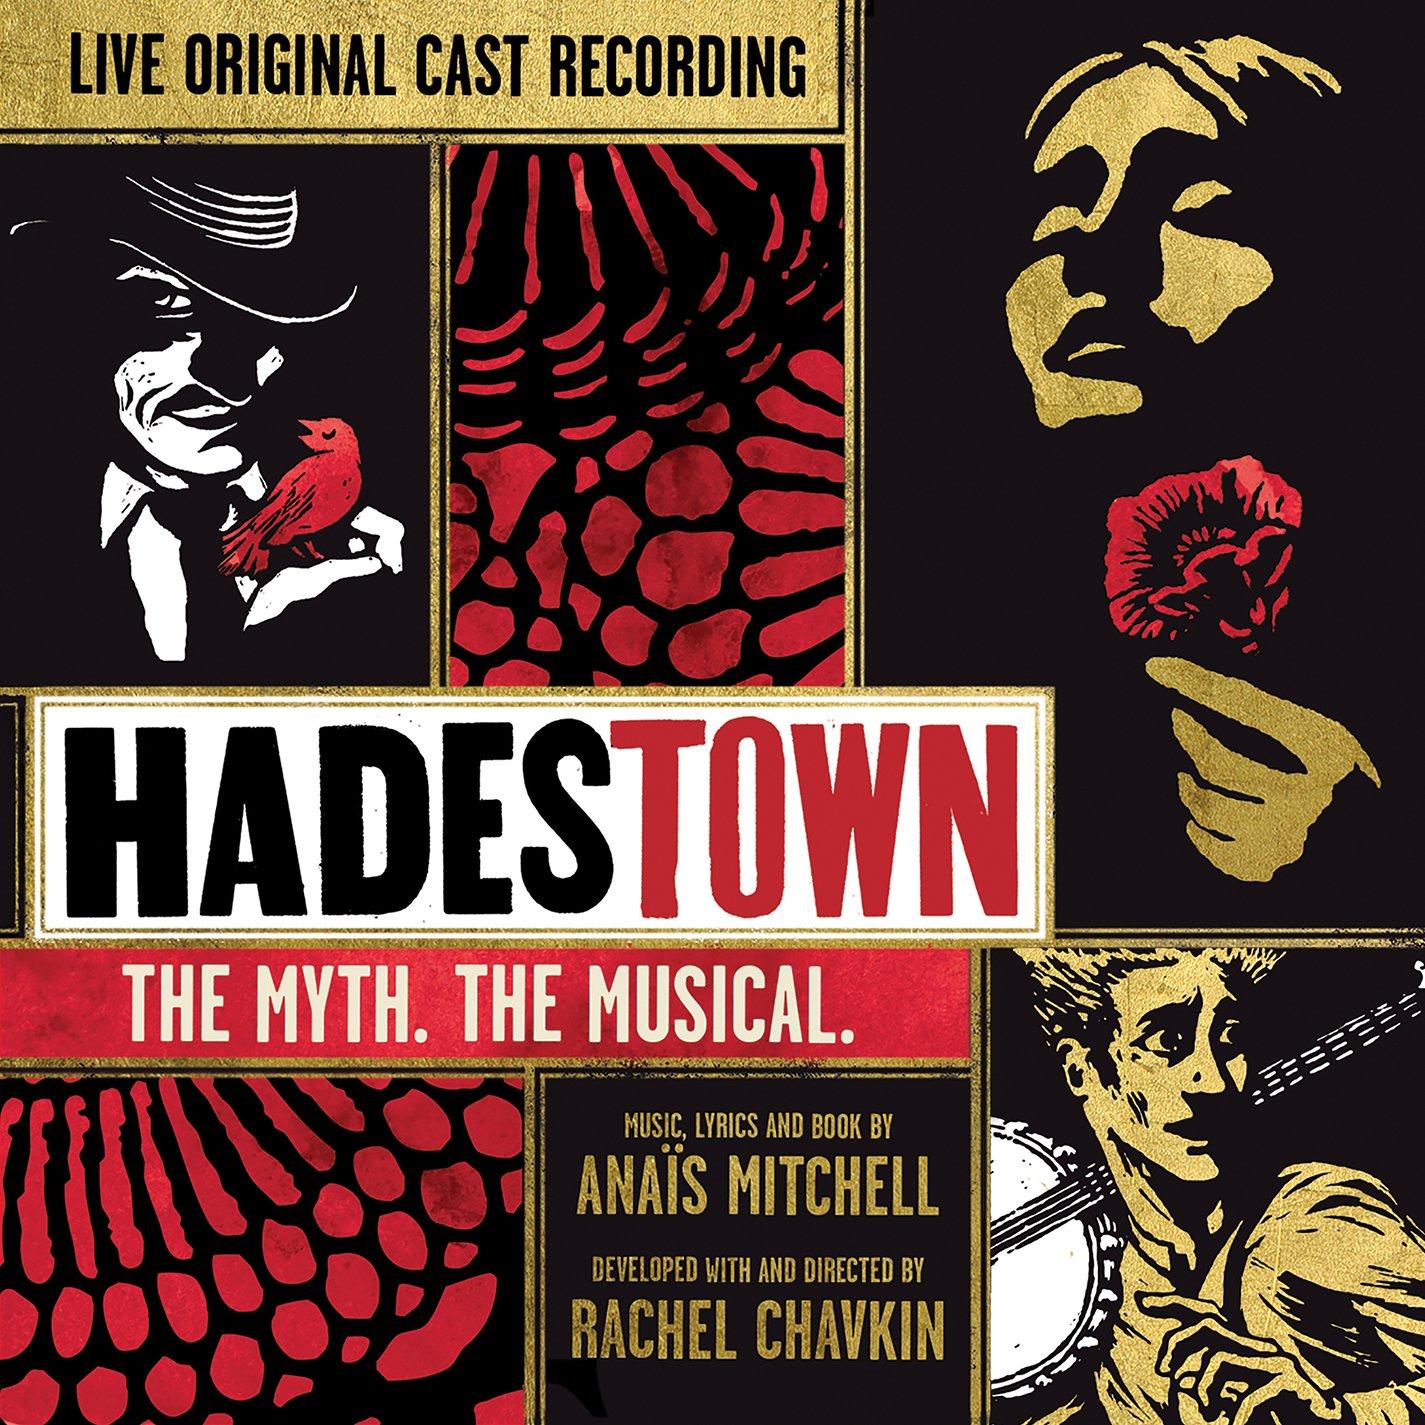 Hadestown The Myth The Musical